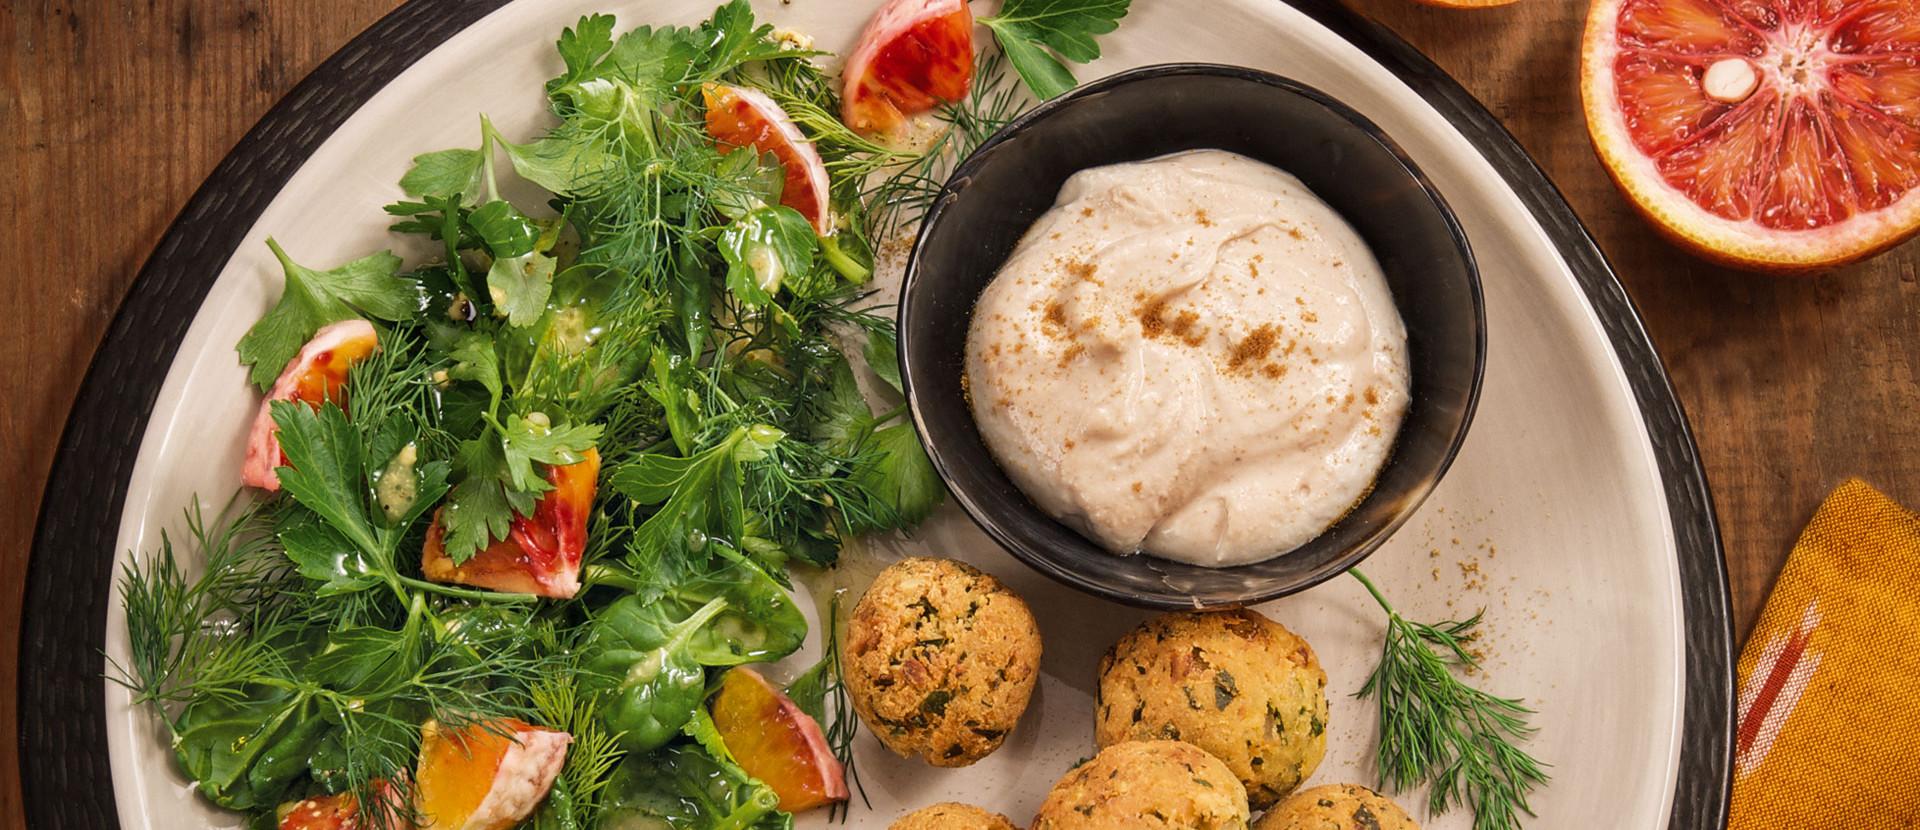 Falafel Kraeutersalat mit Tahinsauce